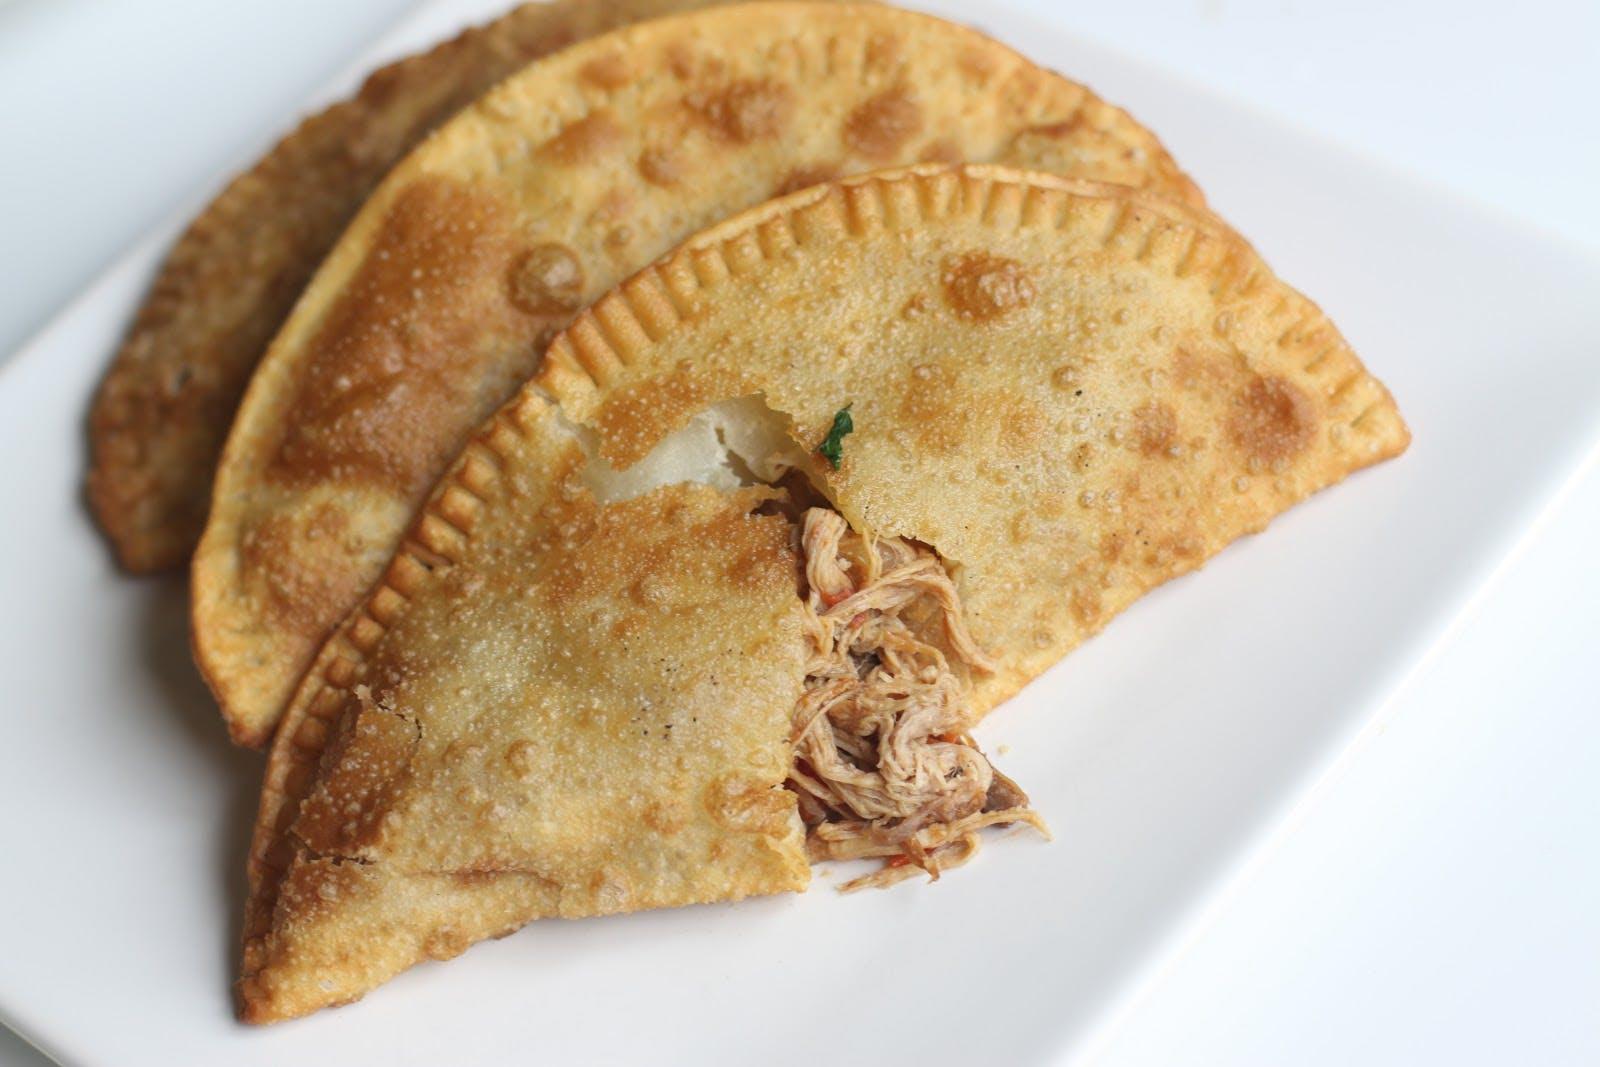 Pulled Pork Empanada from Caracas Empanadas - E Main St in Madison, WI